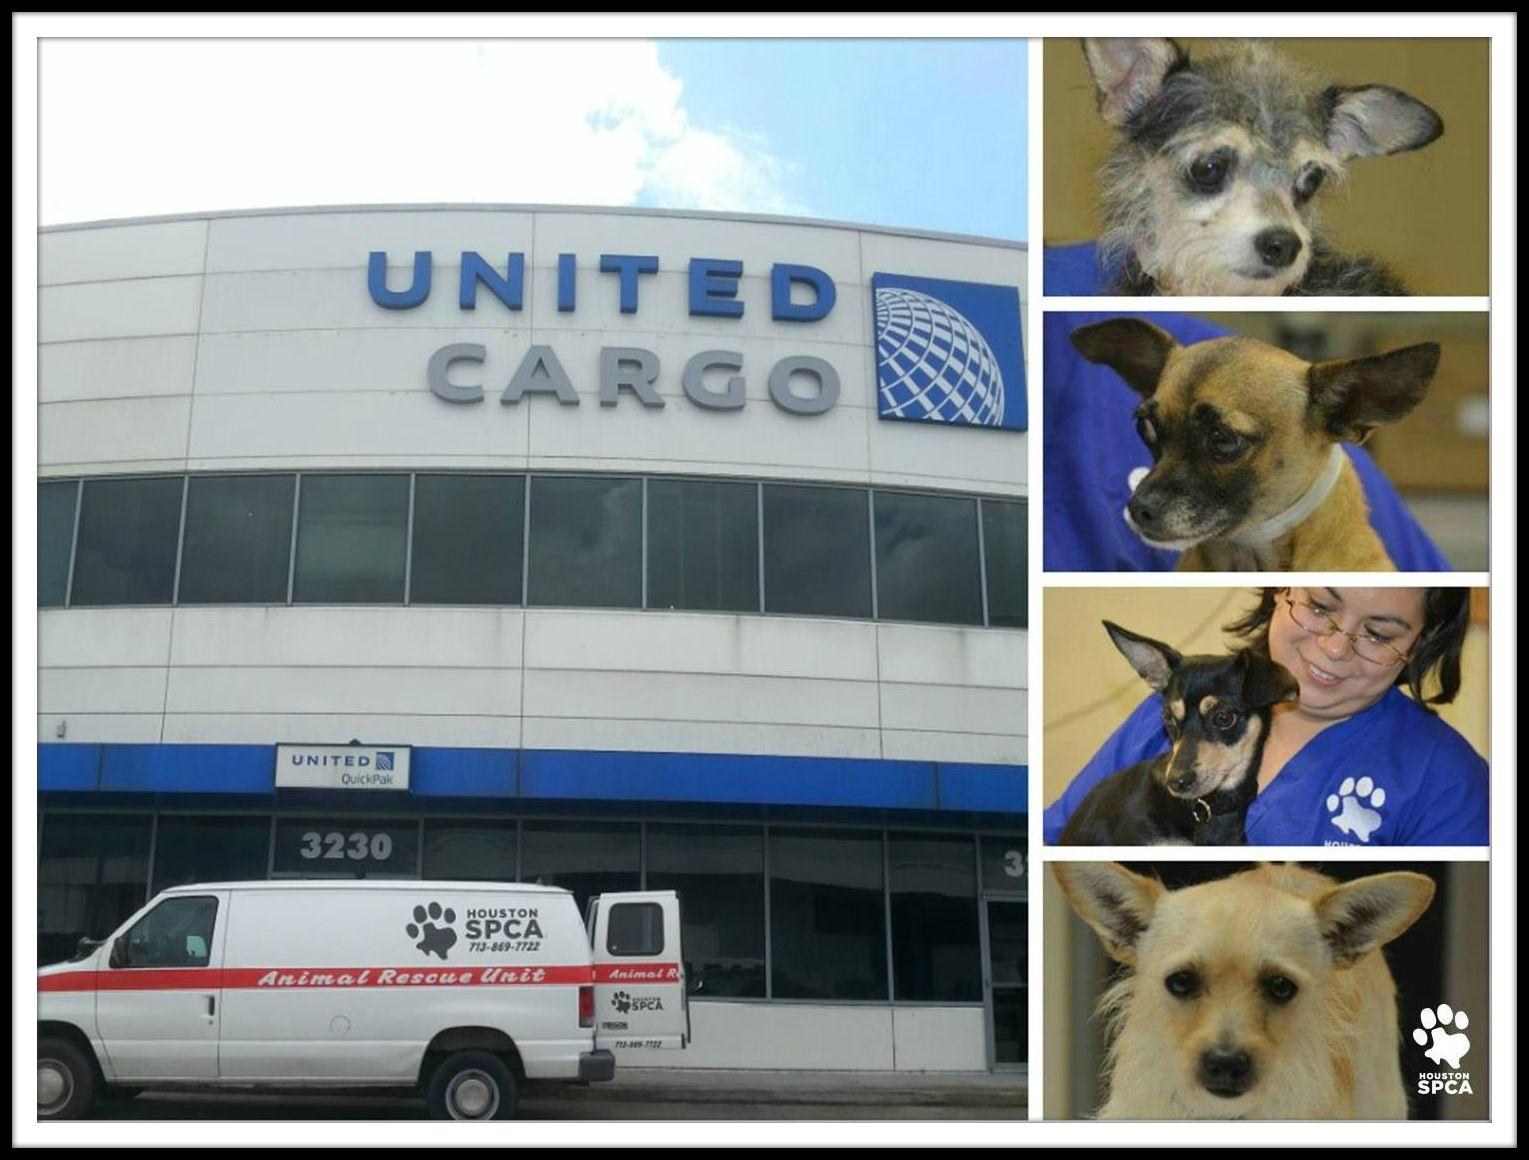 Houston Houston Spca Here Air Chihuahua Has Landed Twenty Homeless Chihuahuas And Small Mixed Breed Dogs From Los A Small Mixed Breed Dogs Mixed Breed Dogs